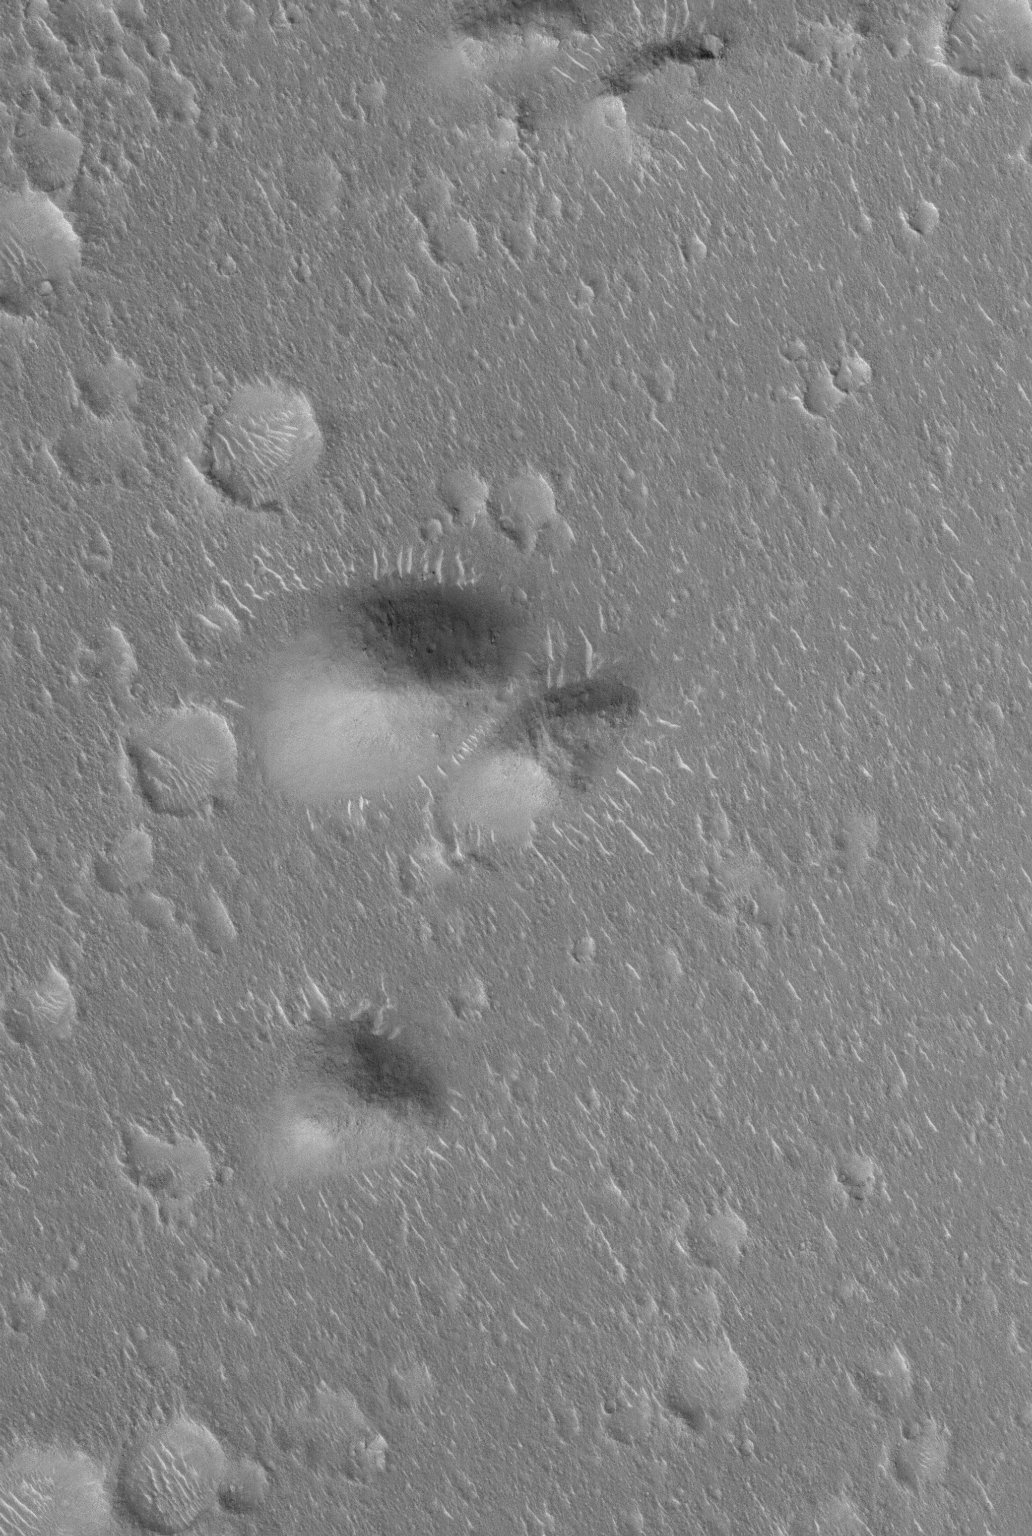 Isidis Landforms : NASA/JPL/Malin Space Science Systems